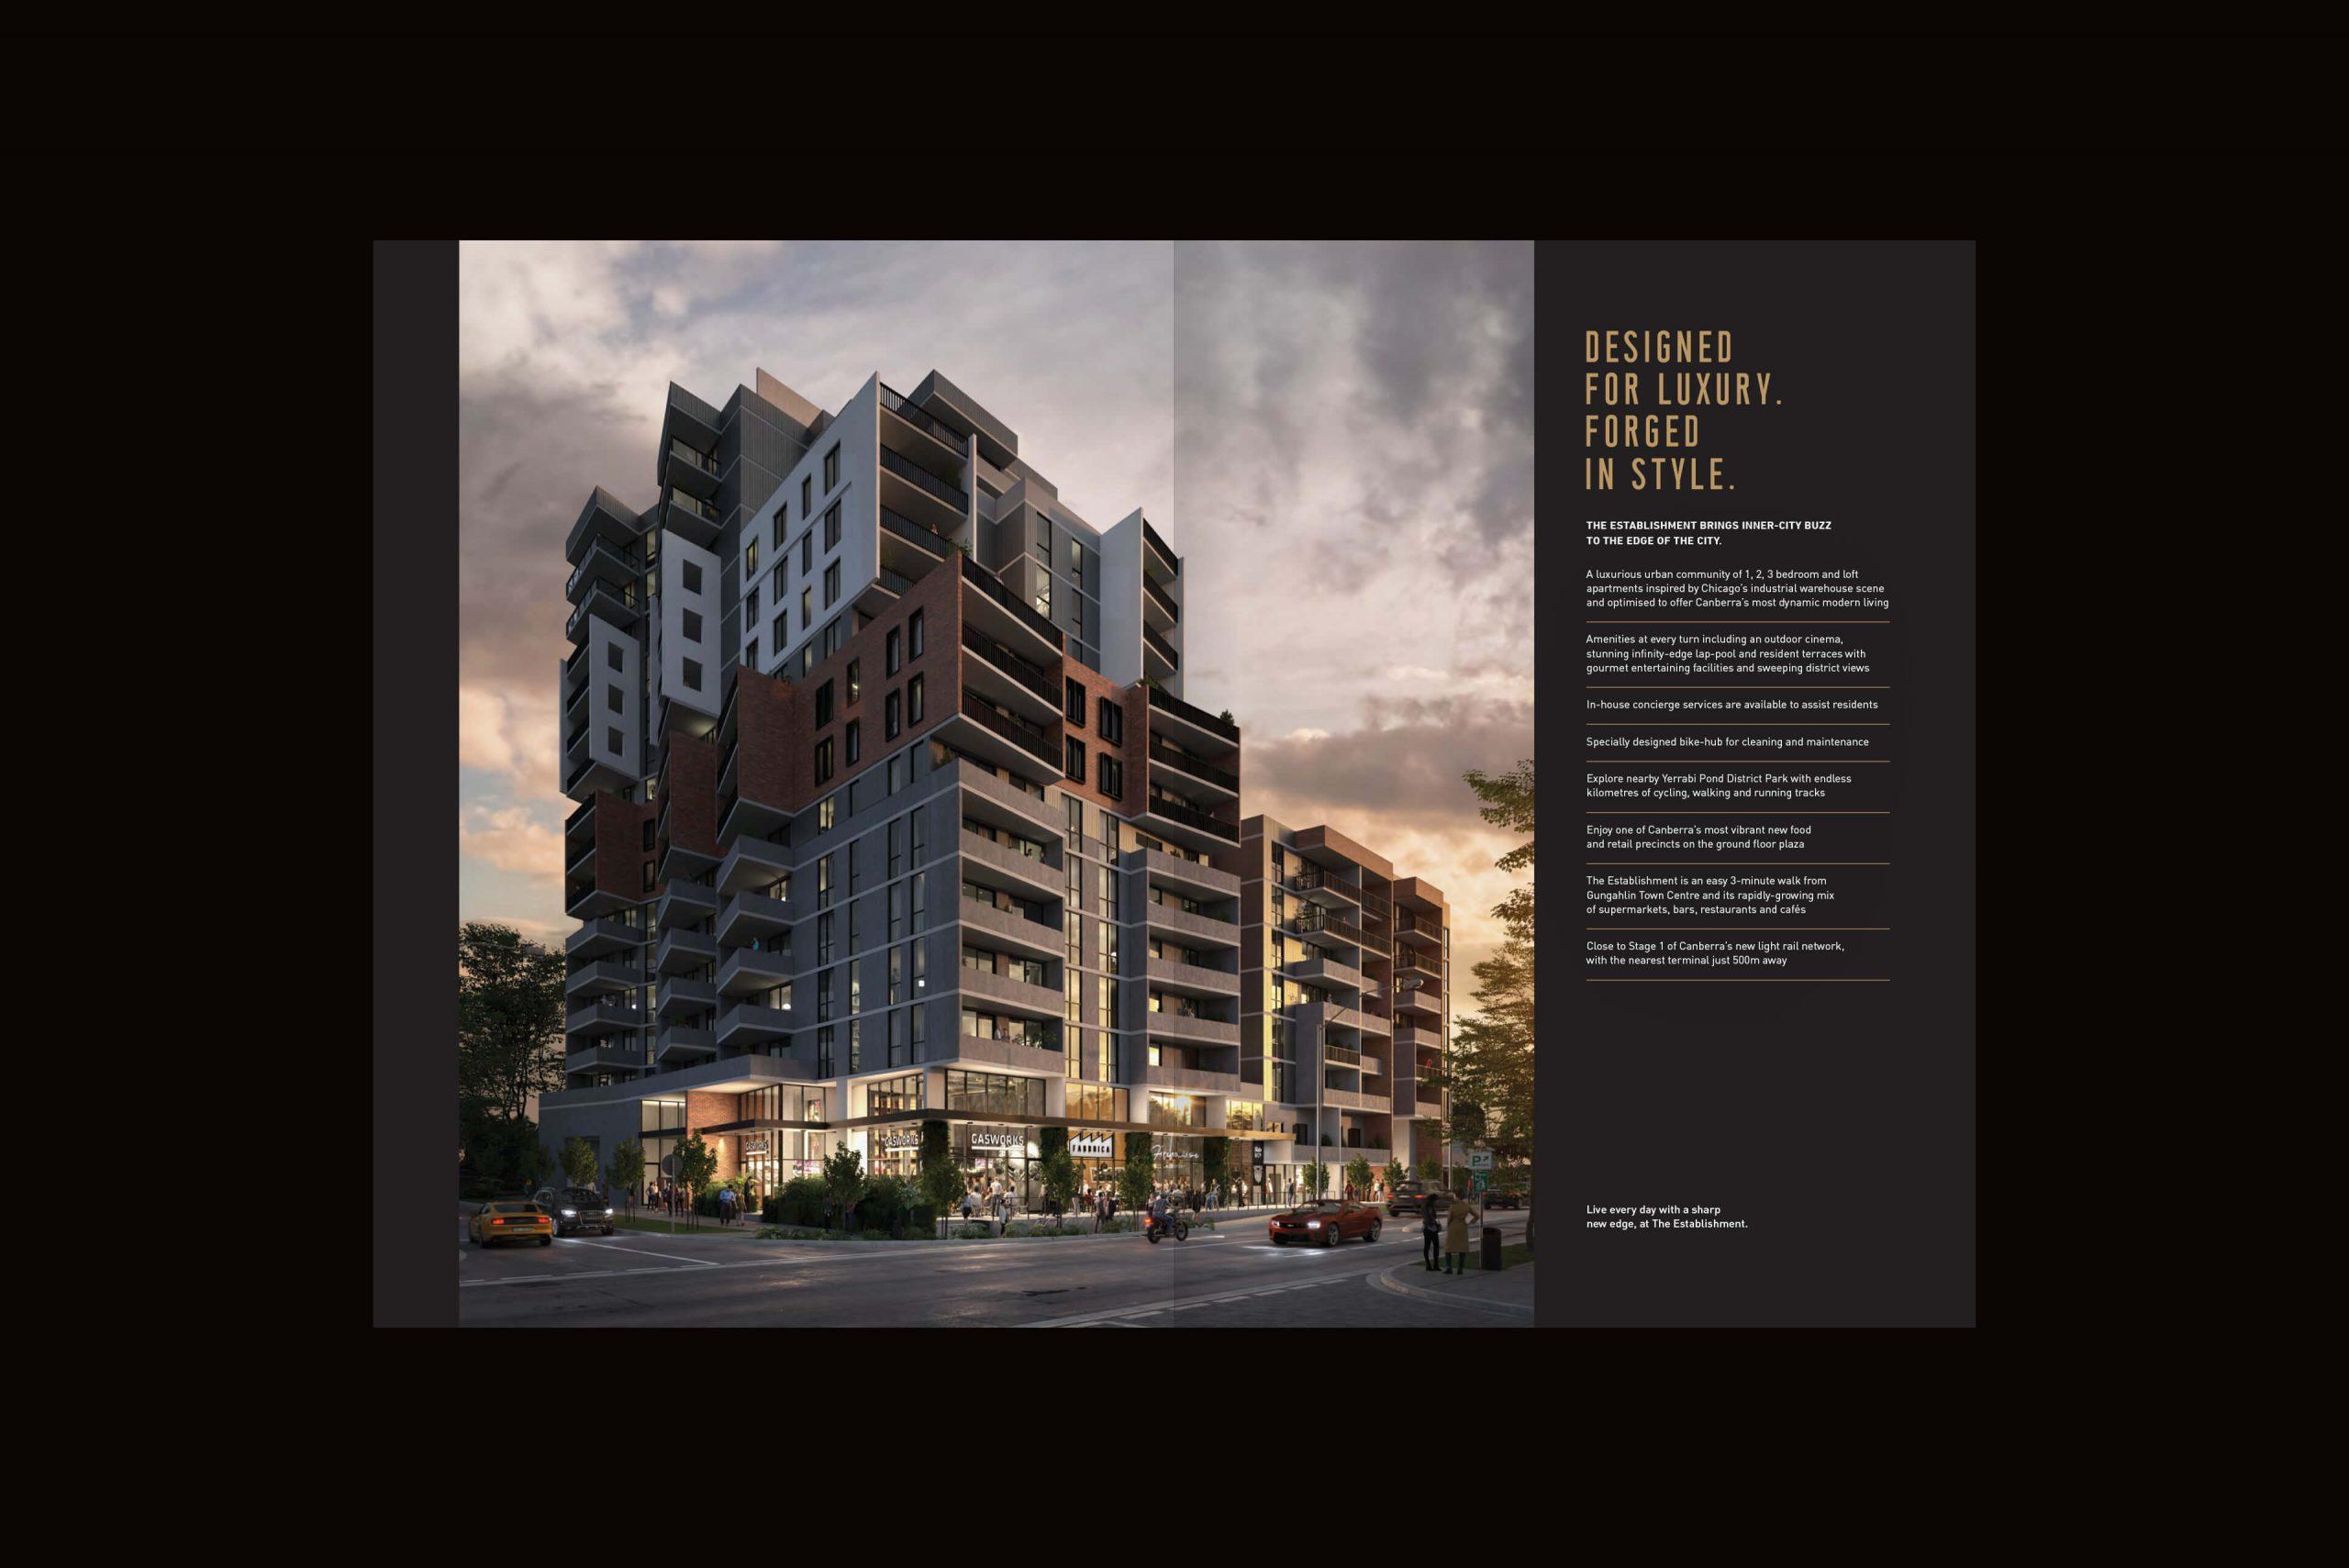 Geocon - The Establishment - Property Identity & Campaign - Hero Building Render & Key Facts Brochure Spread